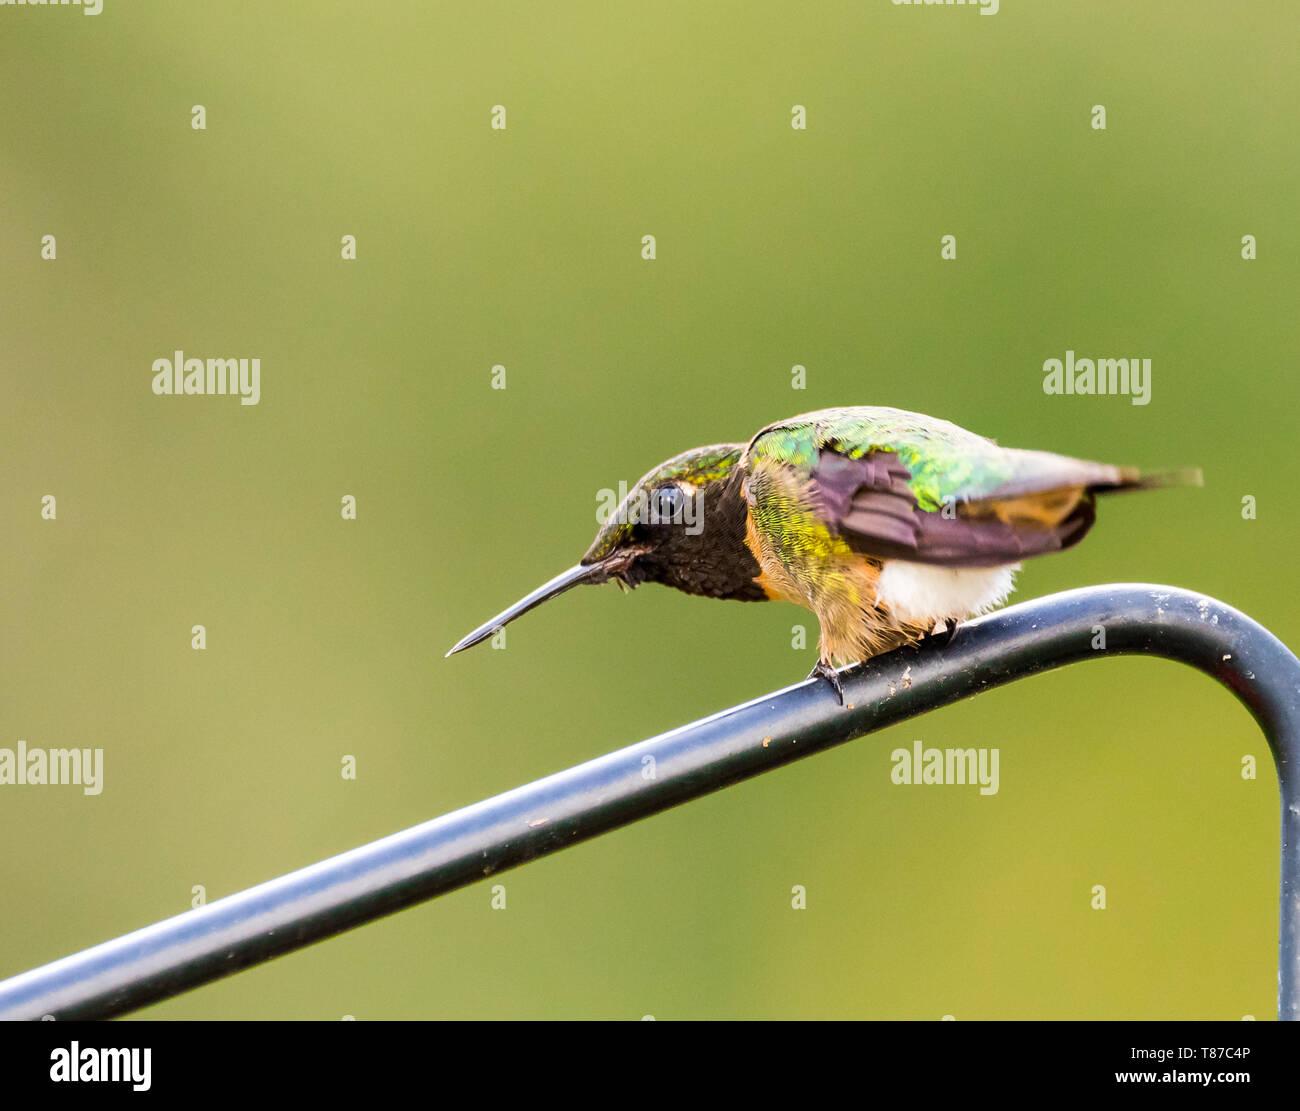 Ruby-Throated macho Colibrí en amenazante para espantar a otro colibrí. Imagen De Stock